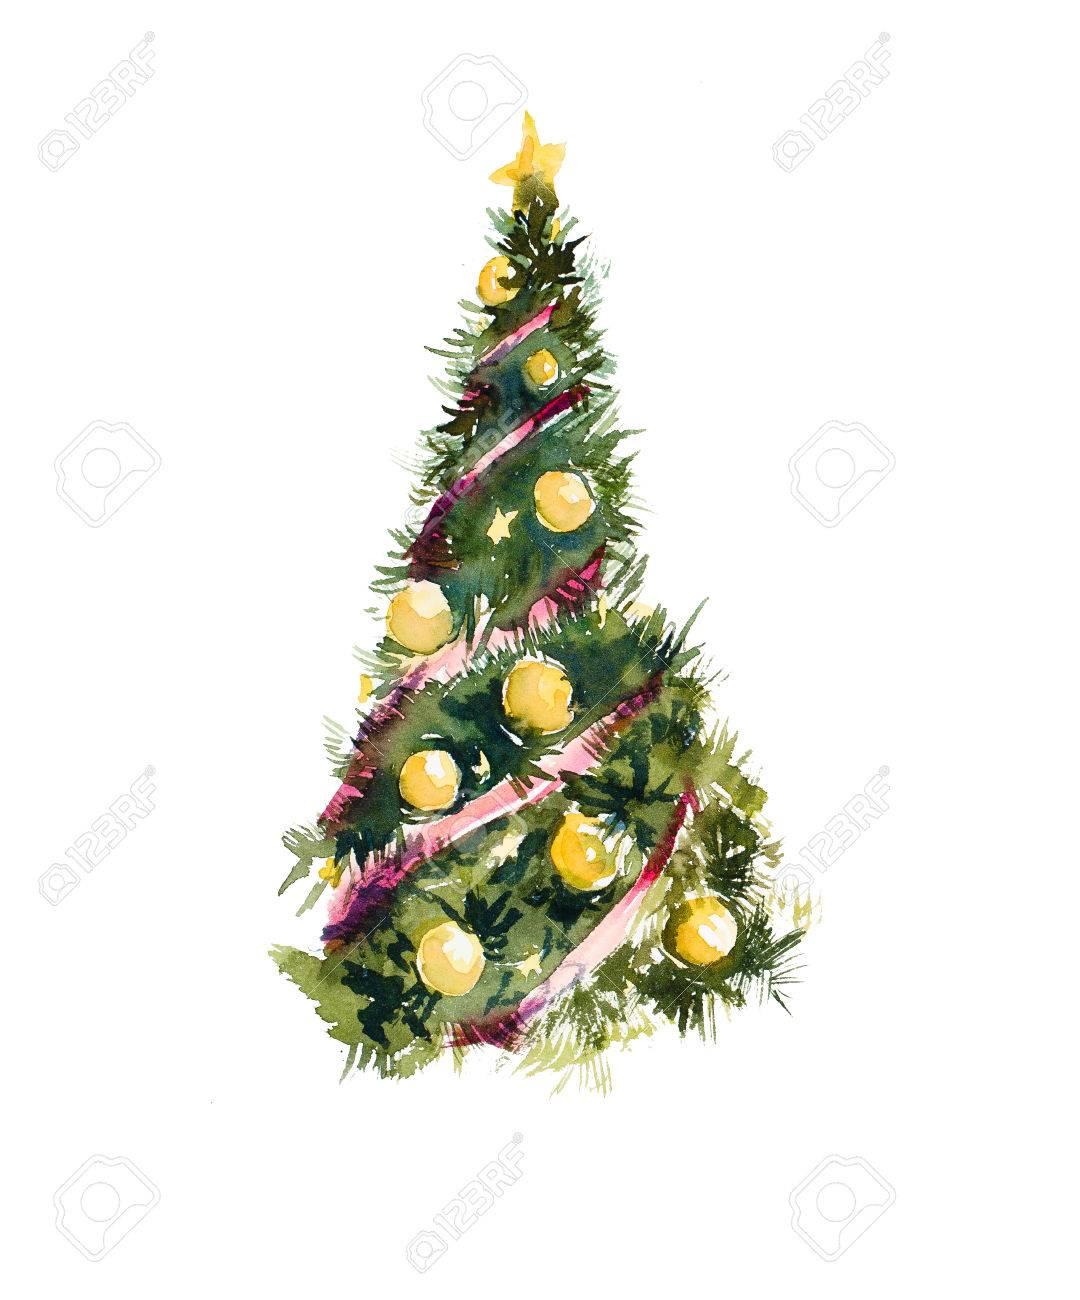 Christmas Tree Watercolor Hand Drawn Illustration Stock Photo